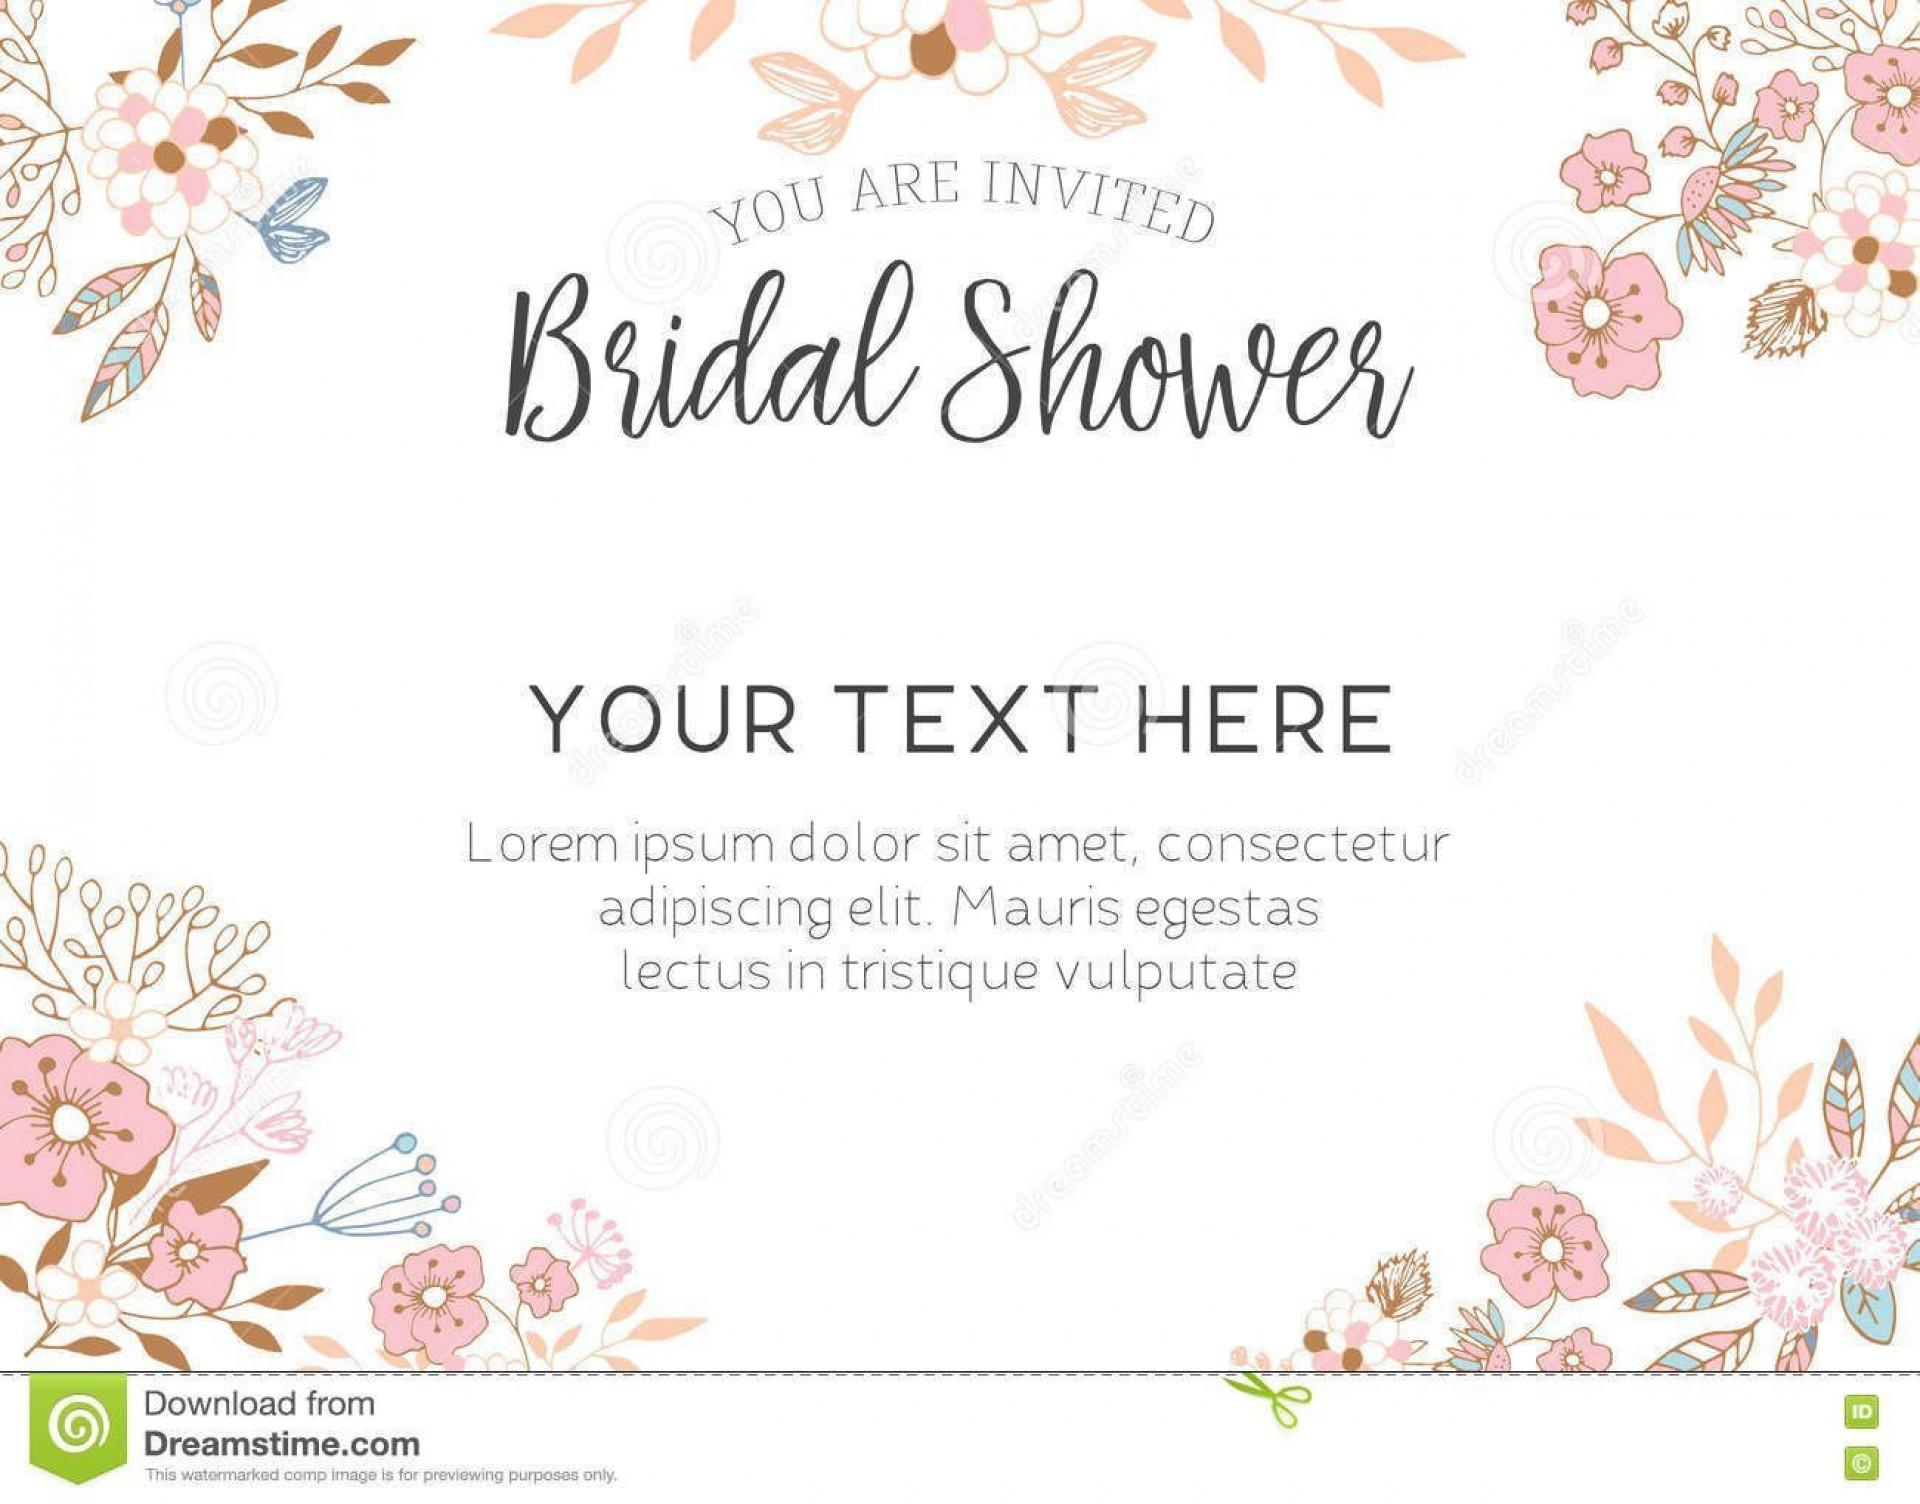 001 Simple Free Bridal Shower Invite Template Design  Invitation For Word Wedding Microsoft1920